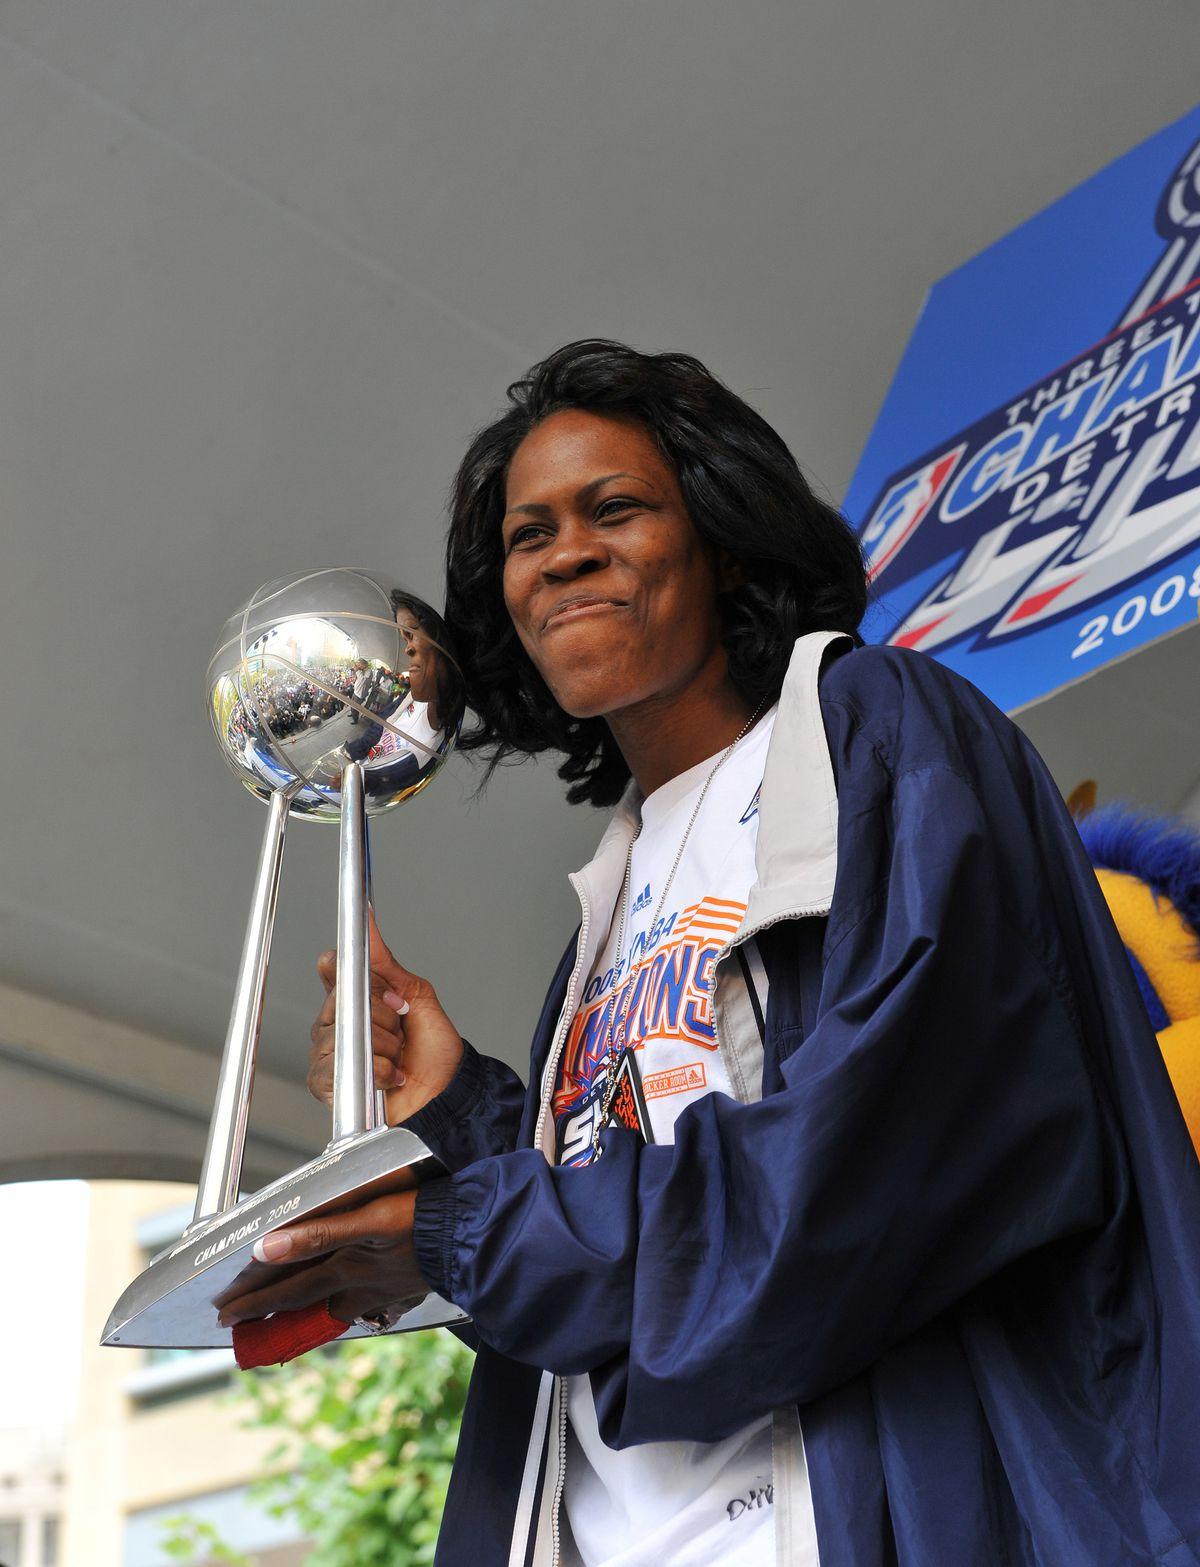 Detroit Shock Victory Celebration Rally